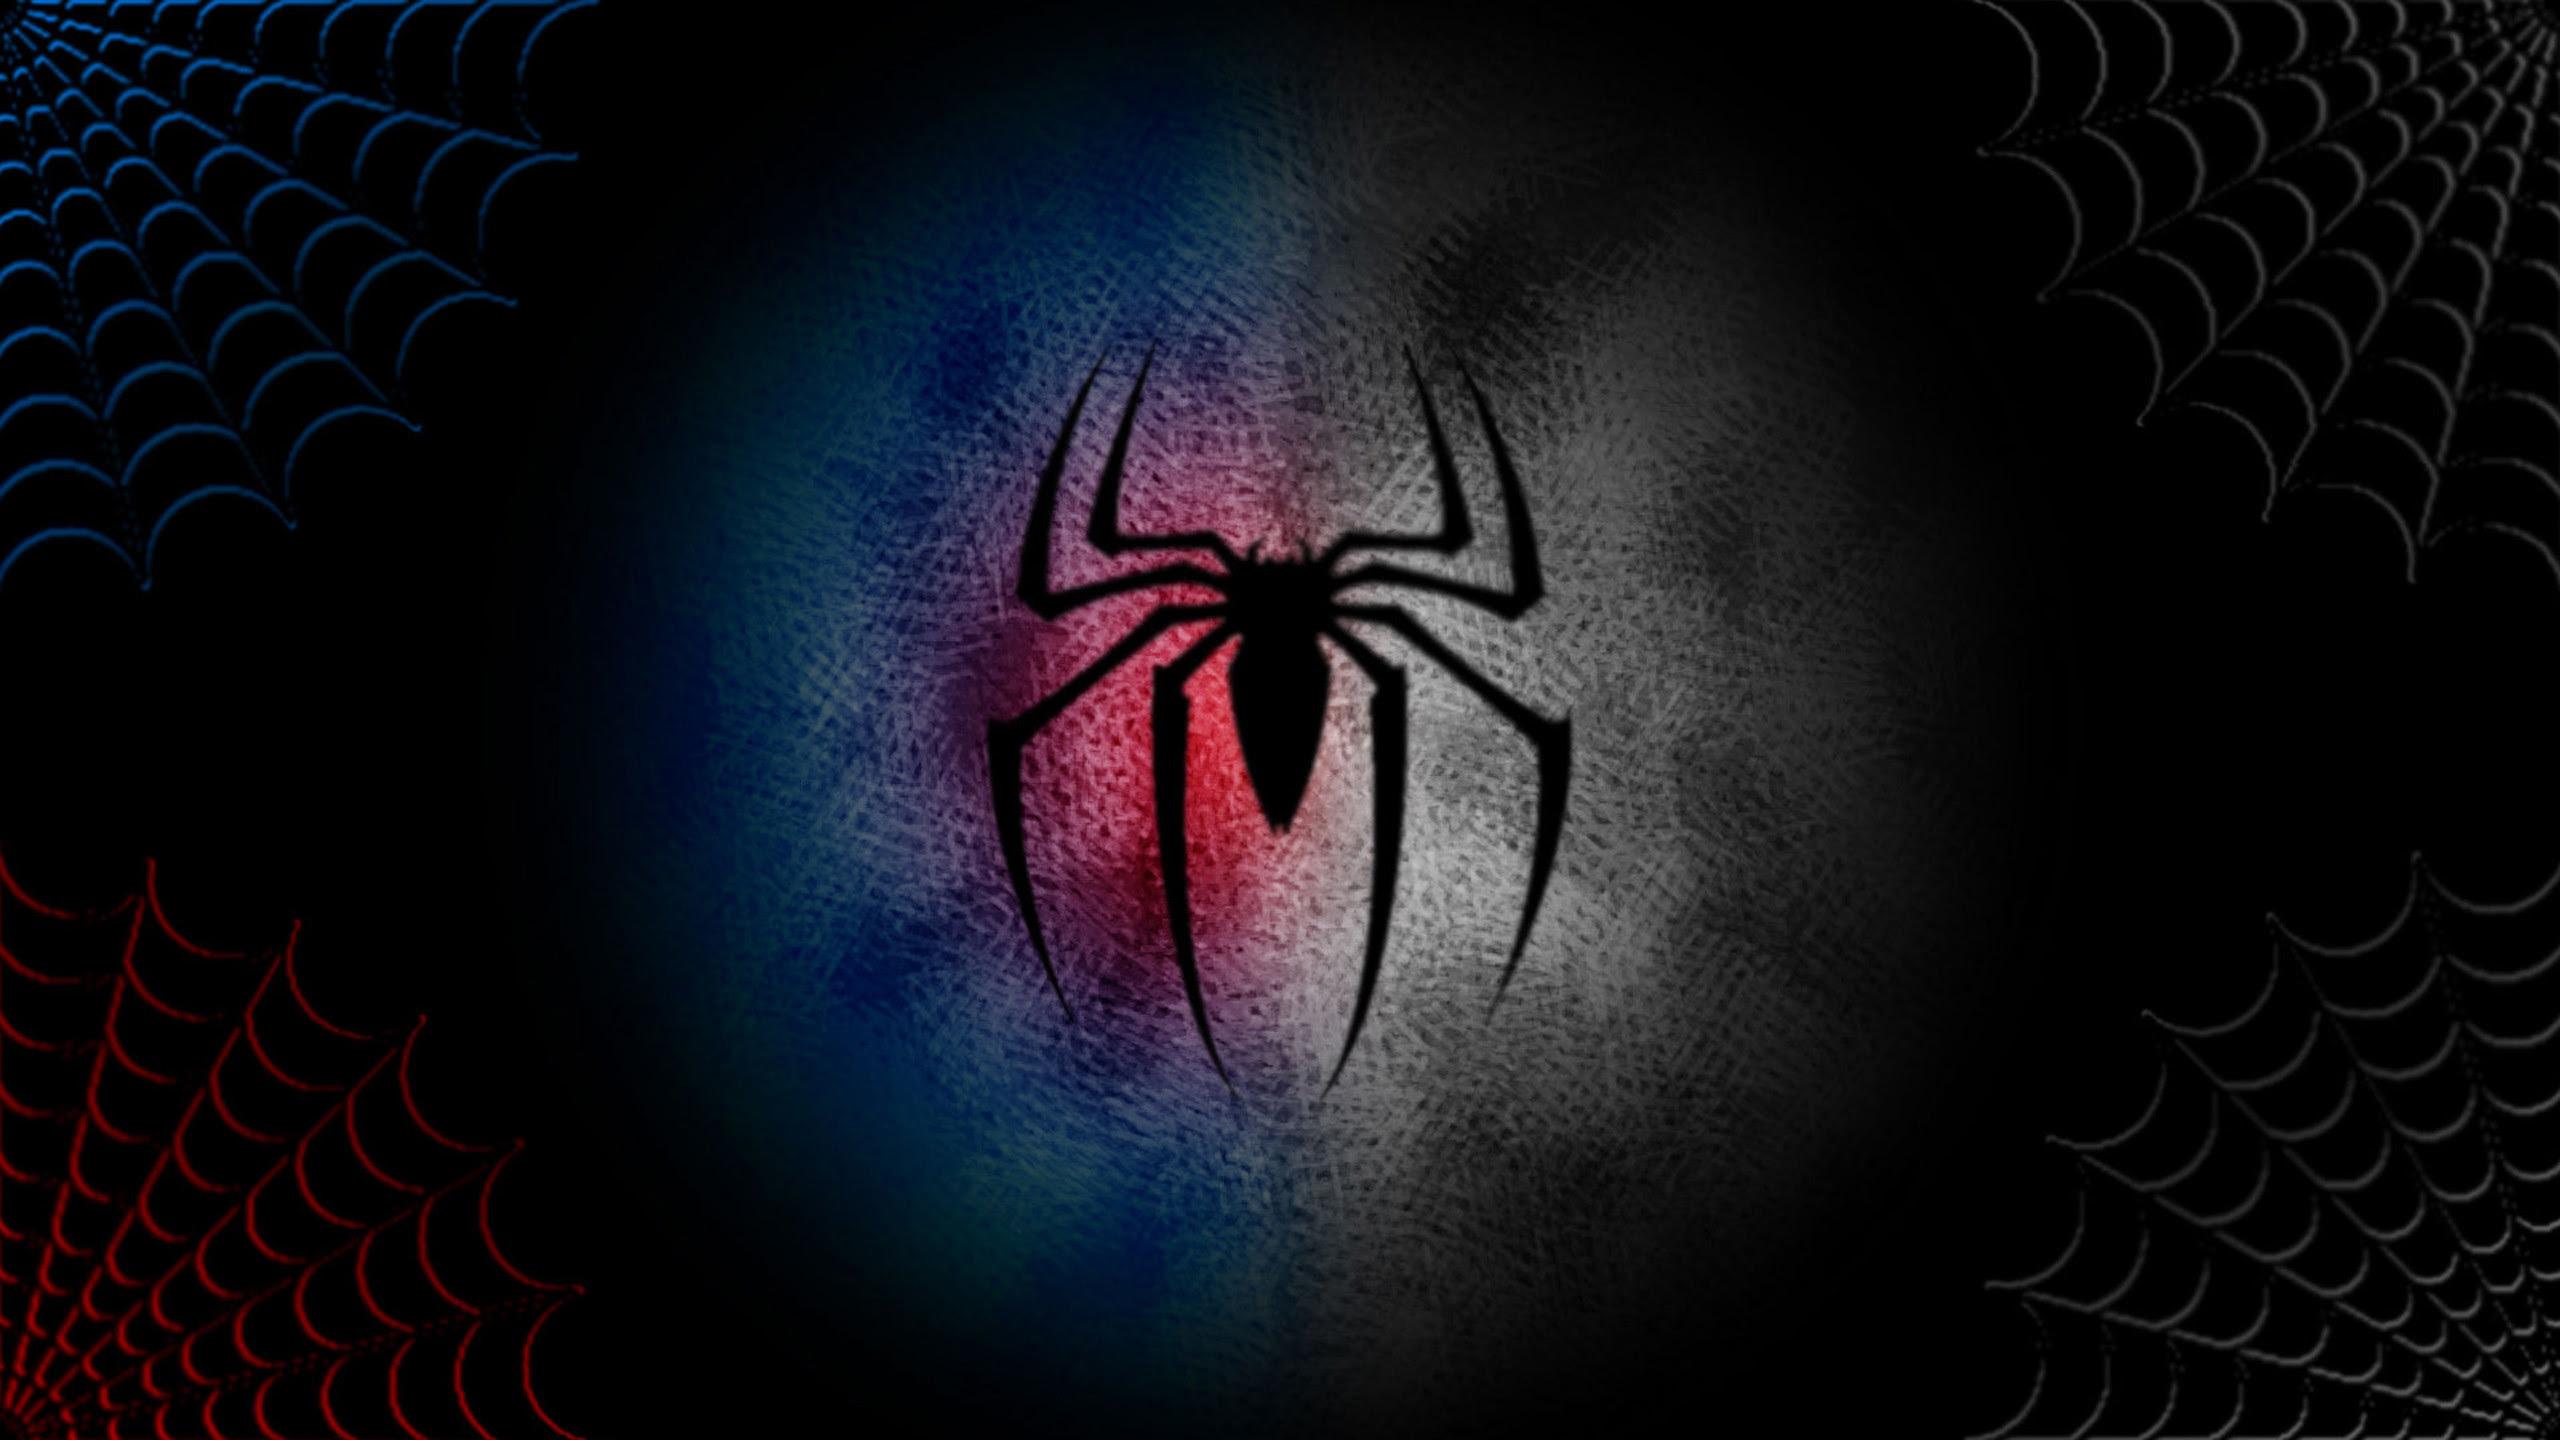 Wallpaper Hd Spiderman 4k Wallpaper For Desktop